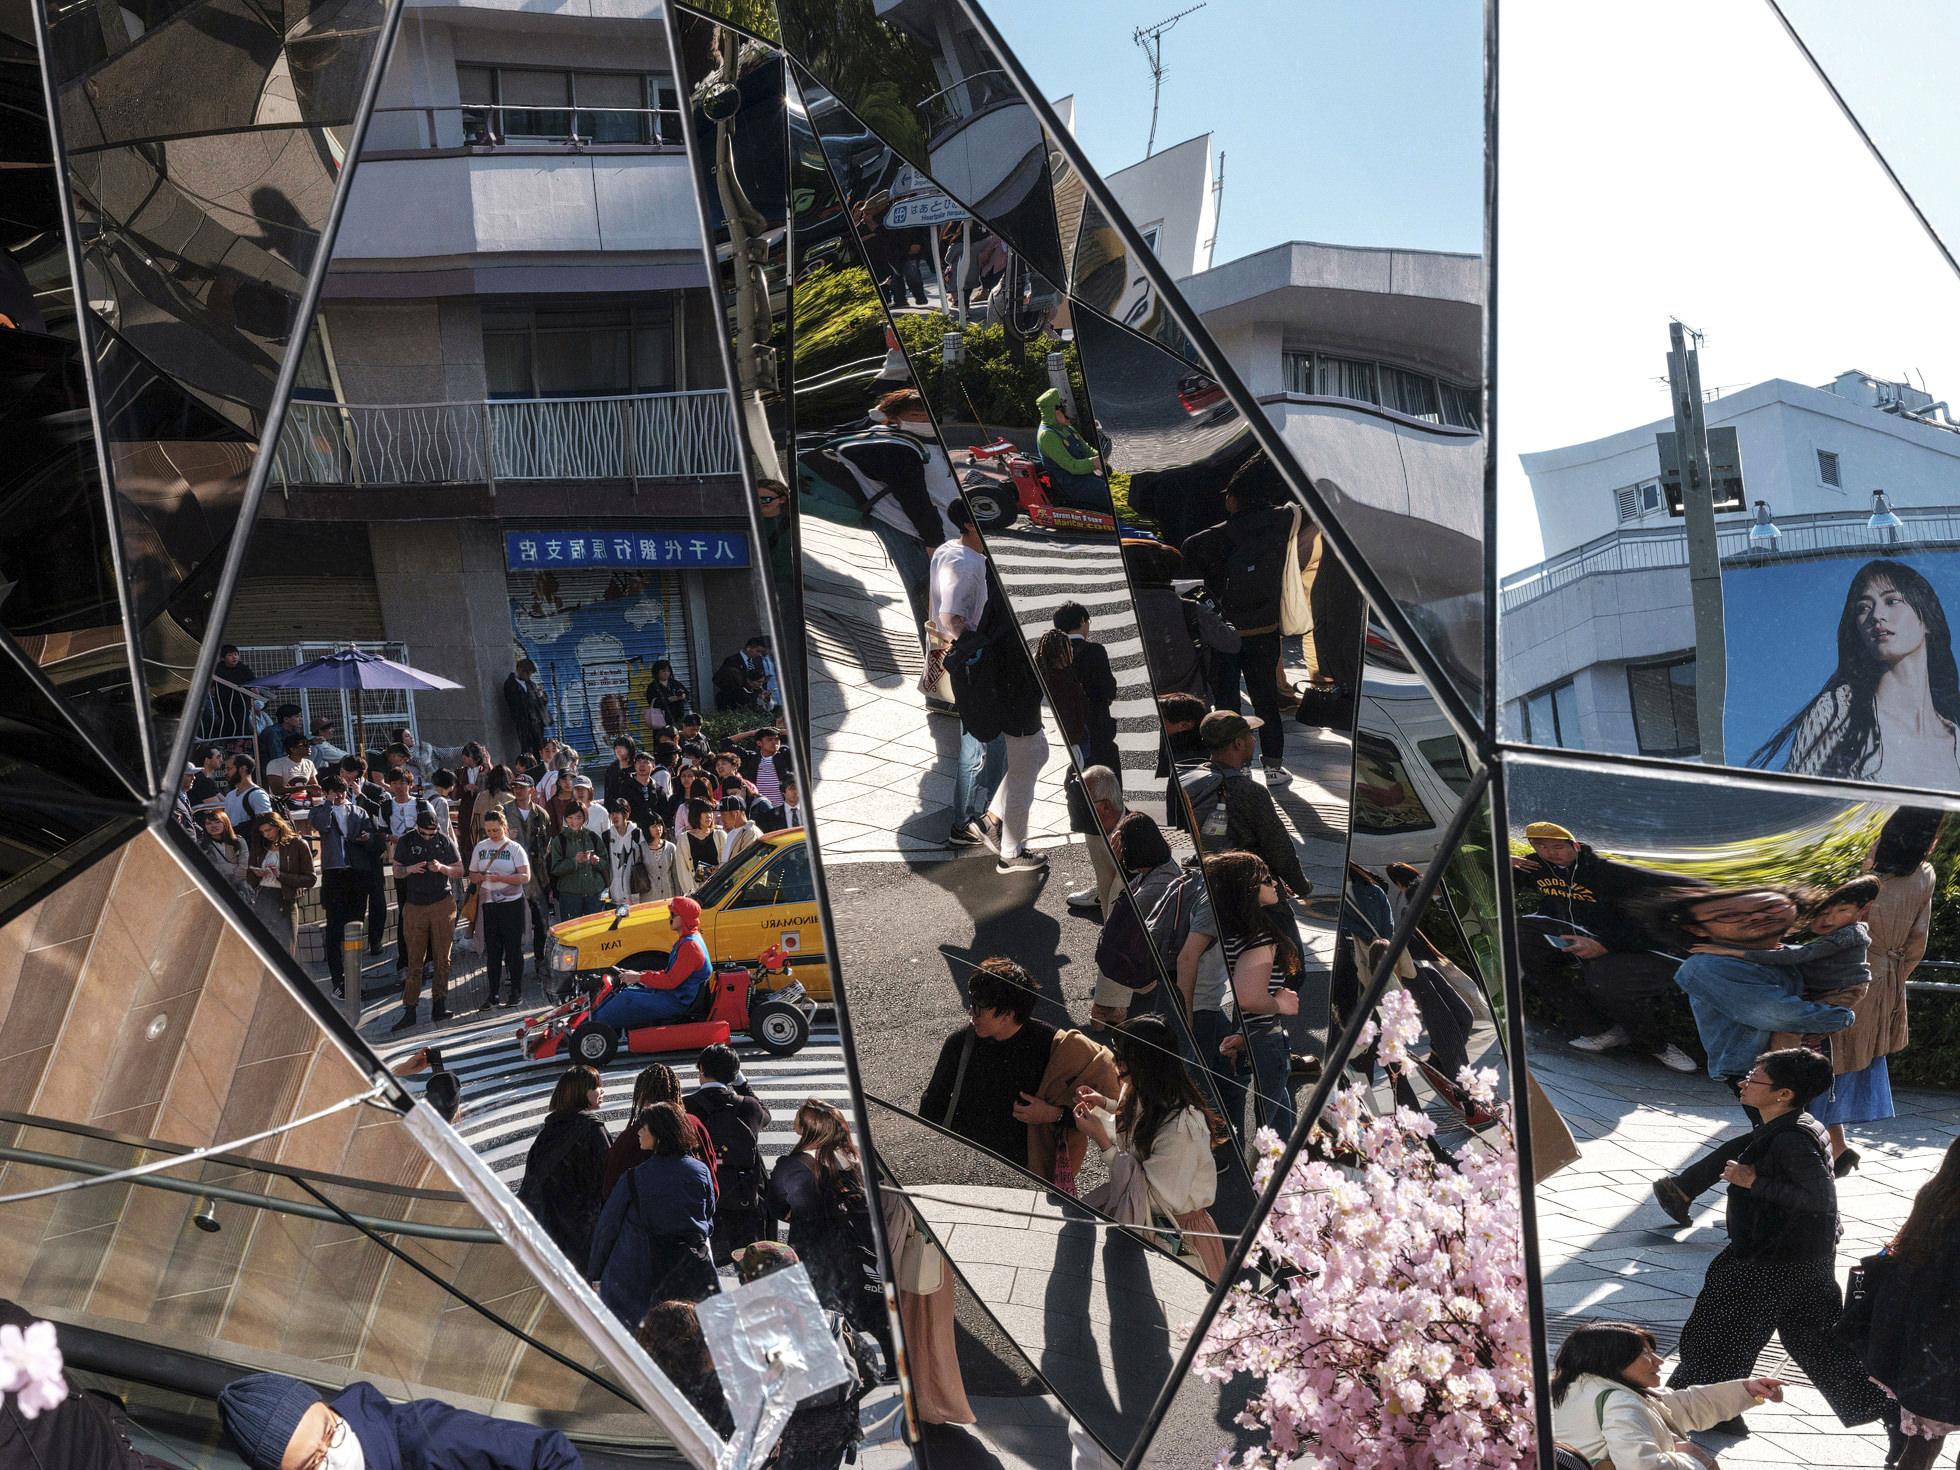 Japan Street Photography Fujifilm GFX